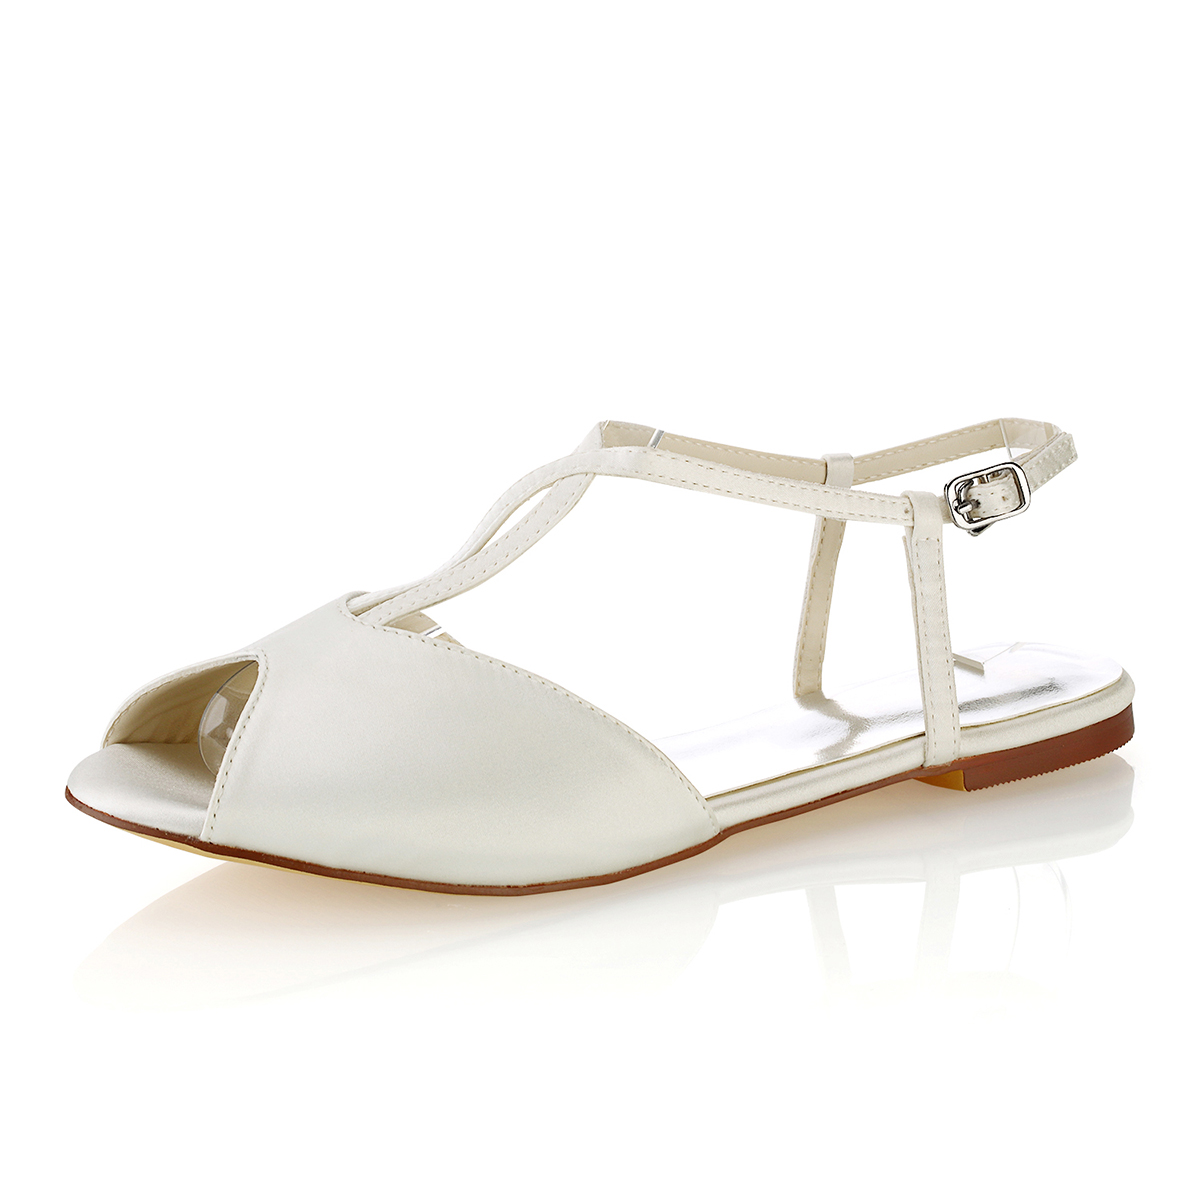 Flats Peep Toe Slingbacks Flat Heel Satin Wedding Shoes With Buckle